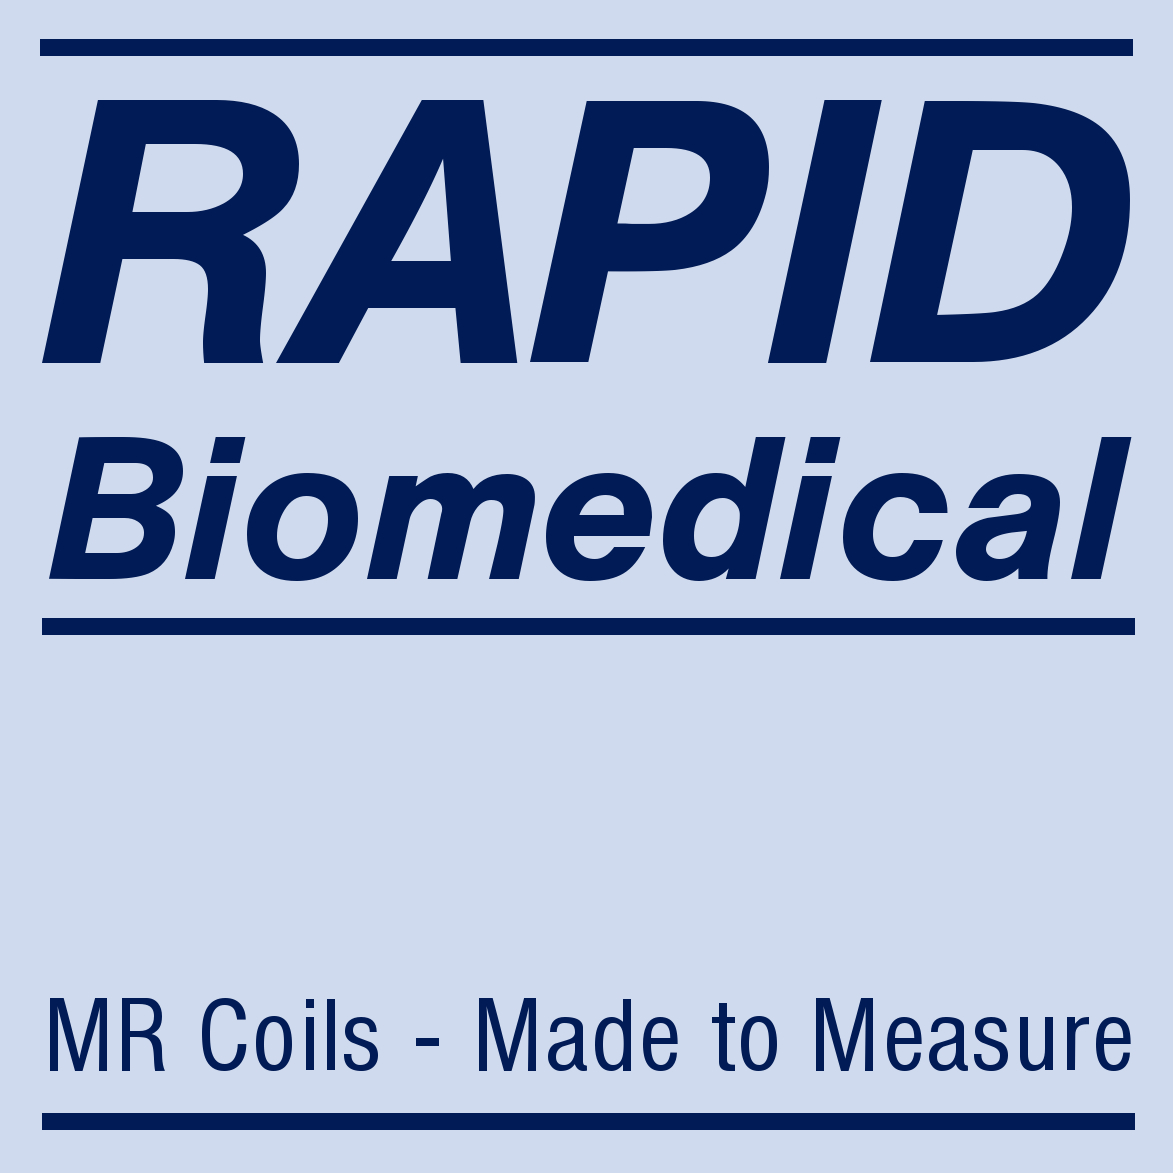 RAPID Biomedical: Exhibitor